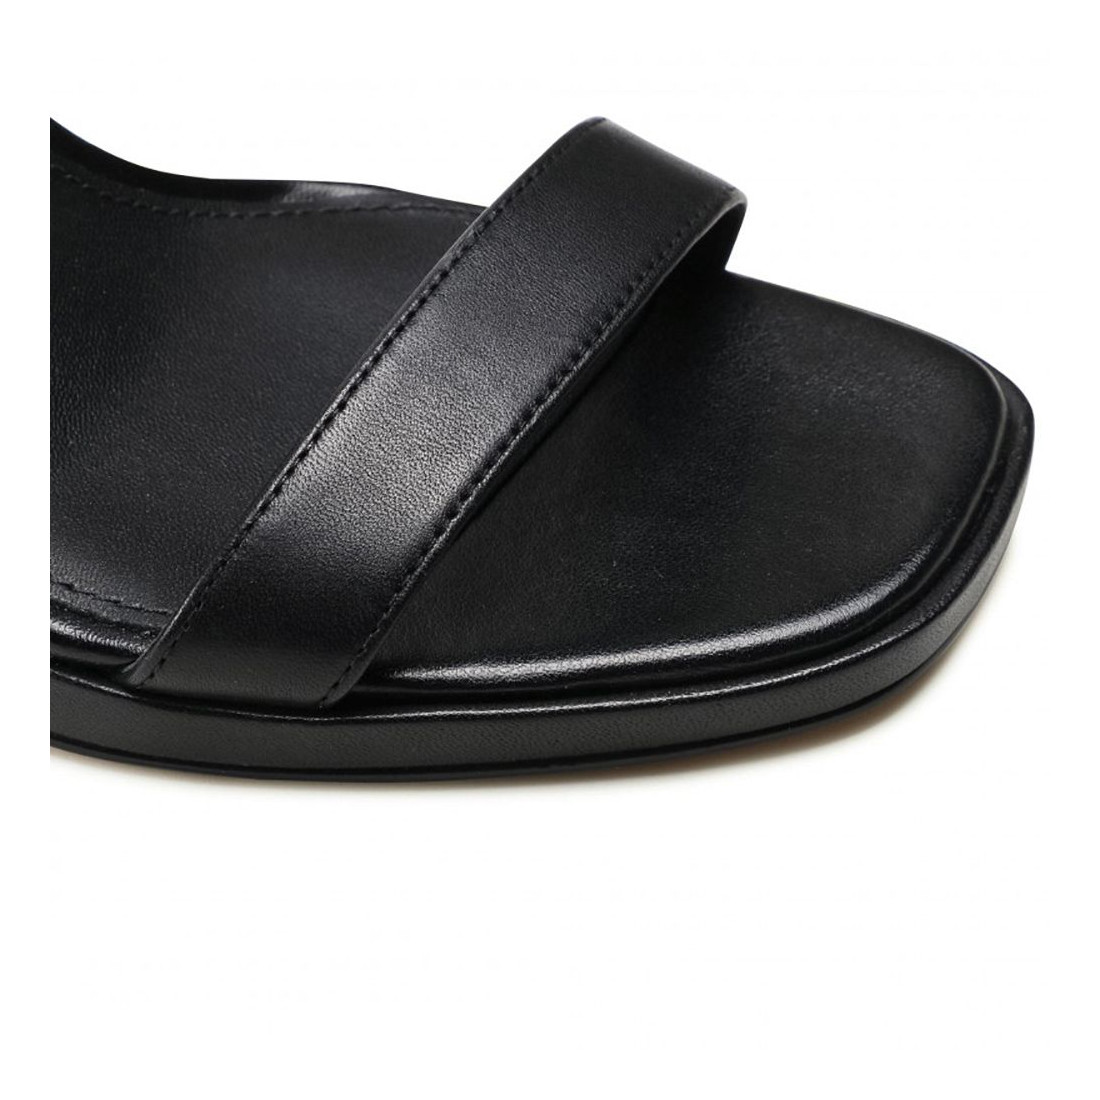 sandalen damen michael kors 40s1anhs3l001 8594